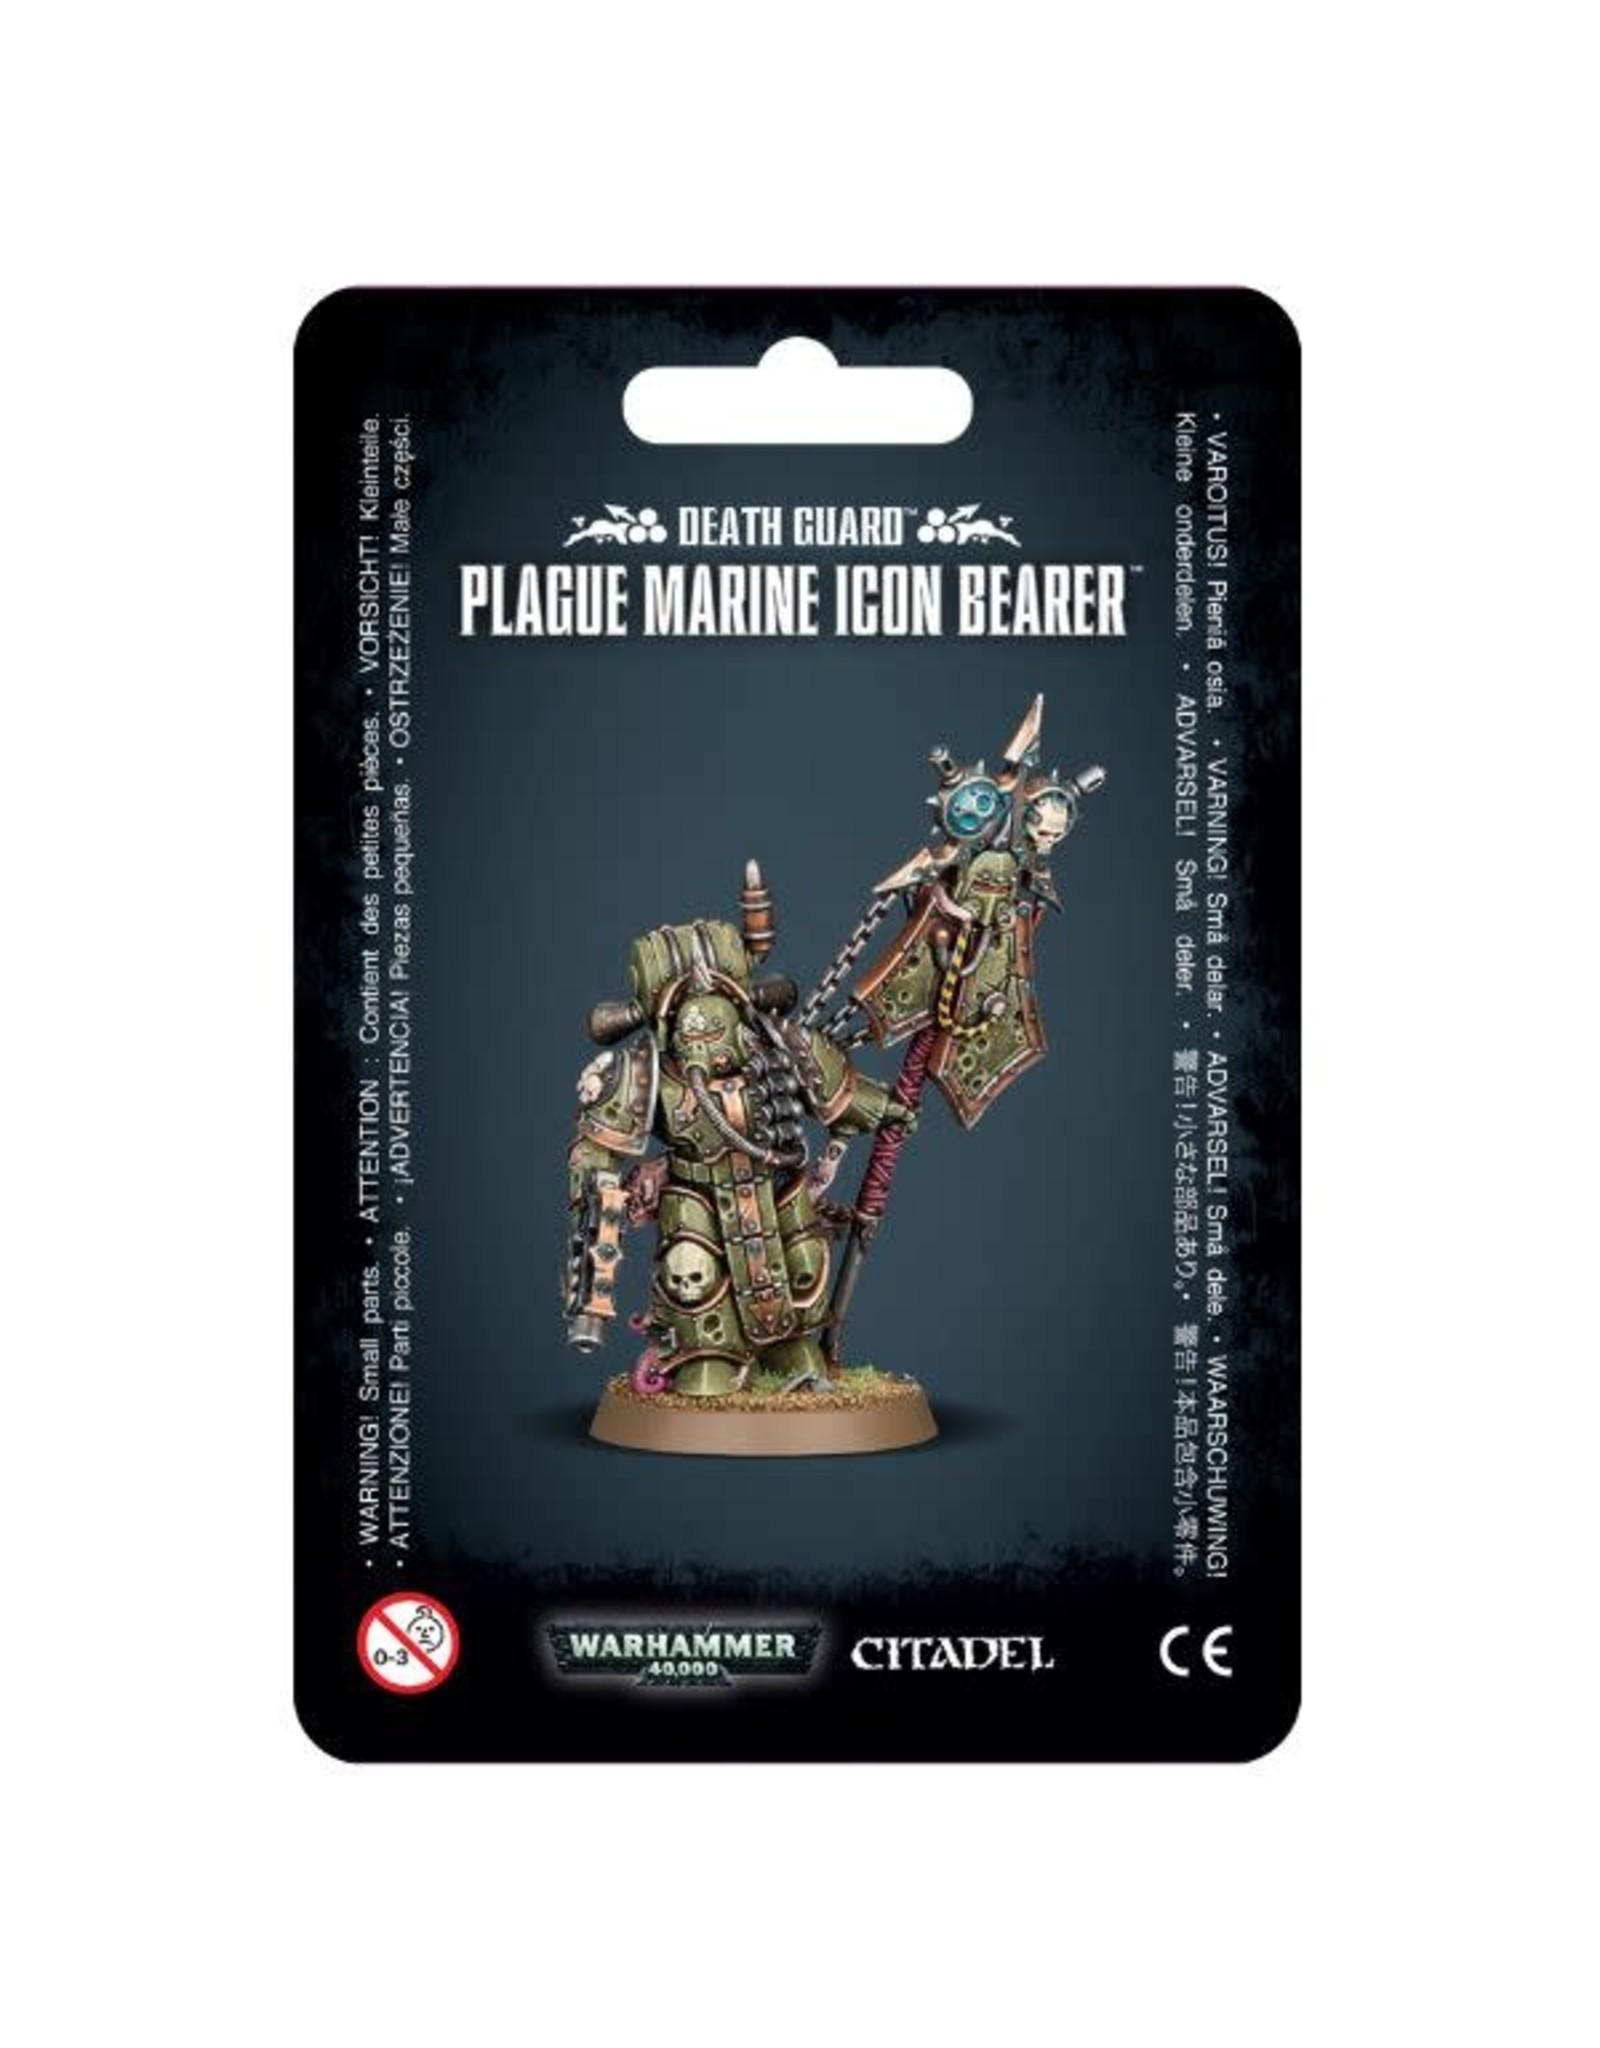 Warhammer 40k Death Guard Plague Marine Icon Bearer